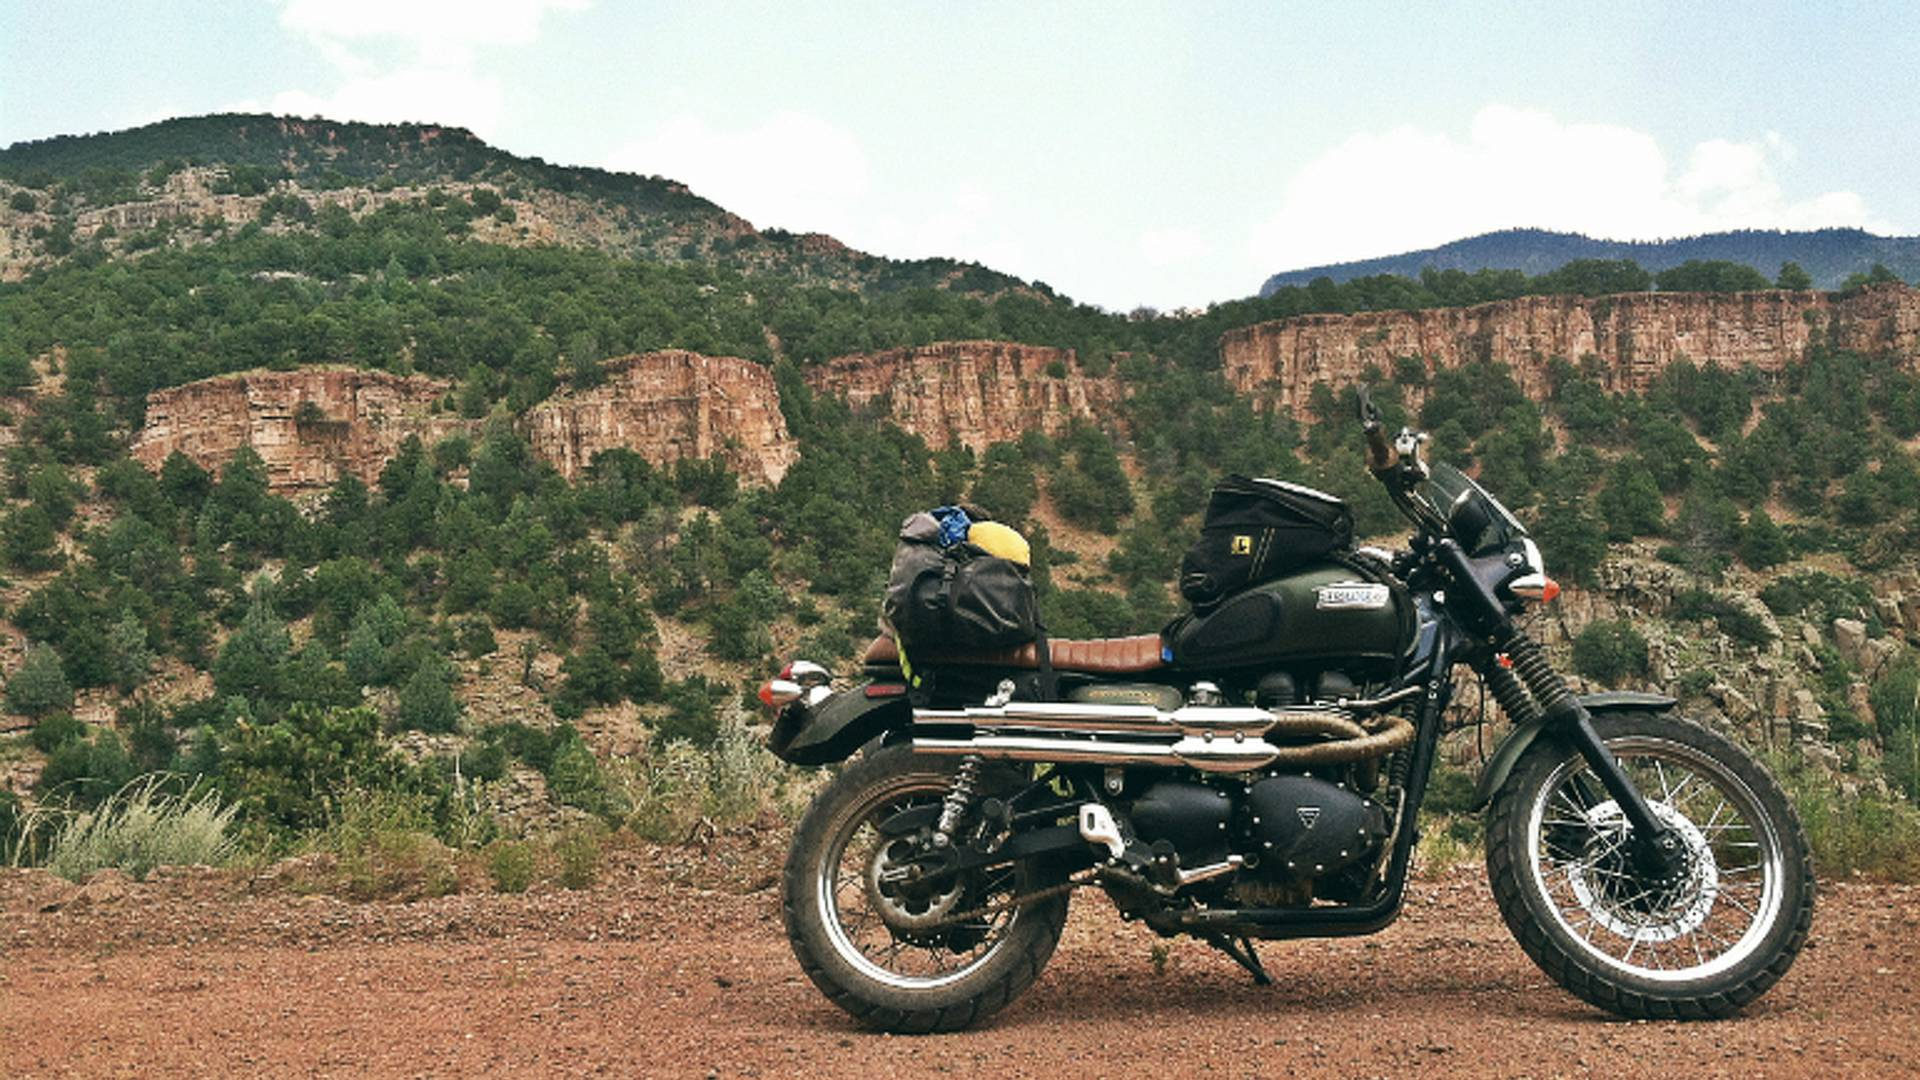 The Off Road Triumph Scrambler Adventure